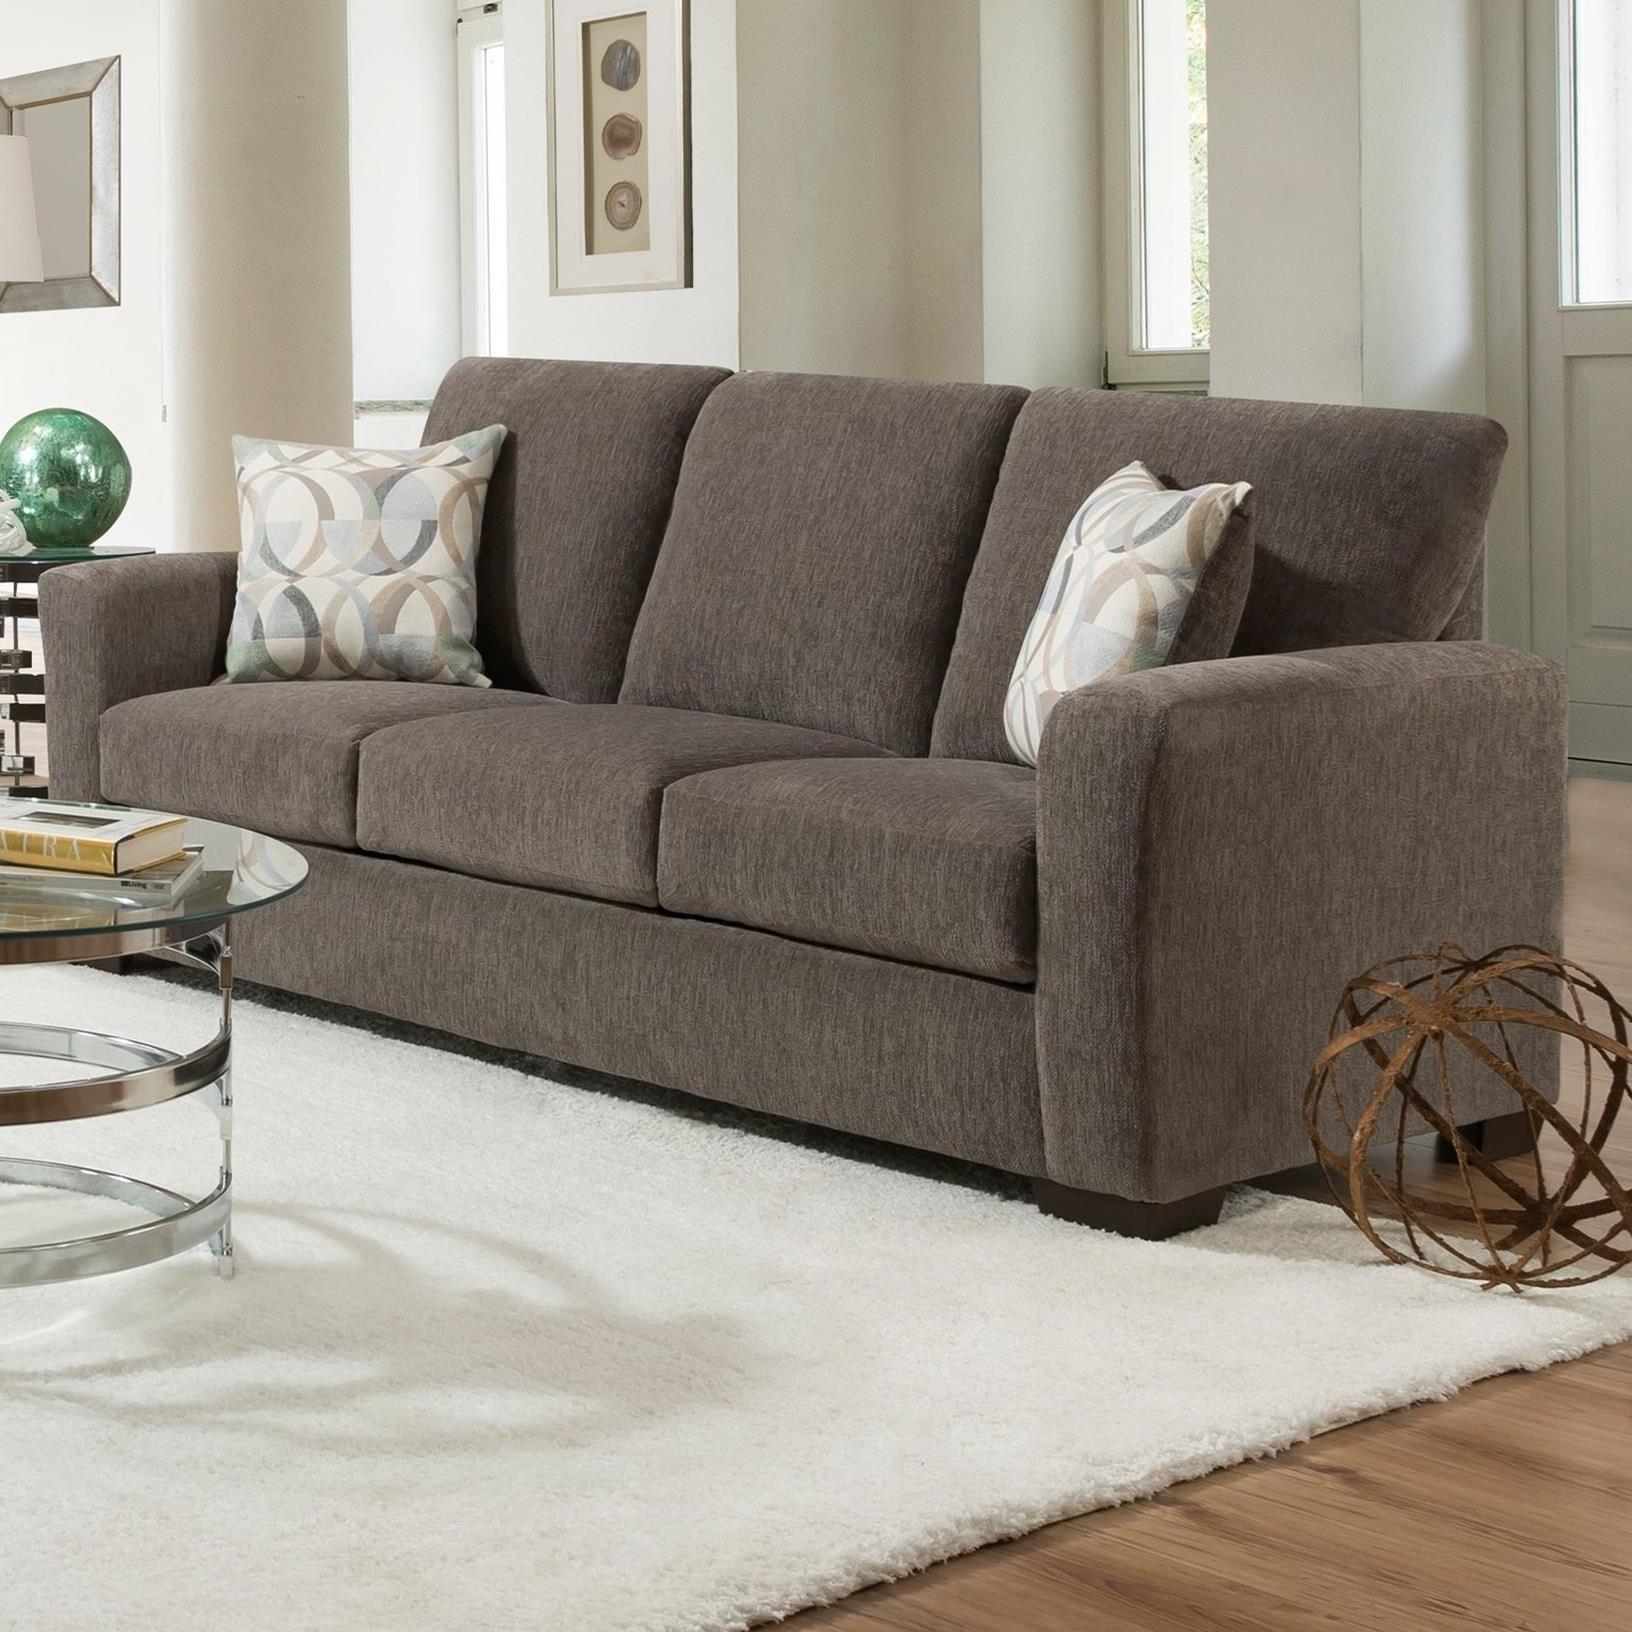 1210 Sofa  by Peak Living at Prime Brothers Furniture